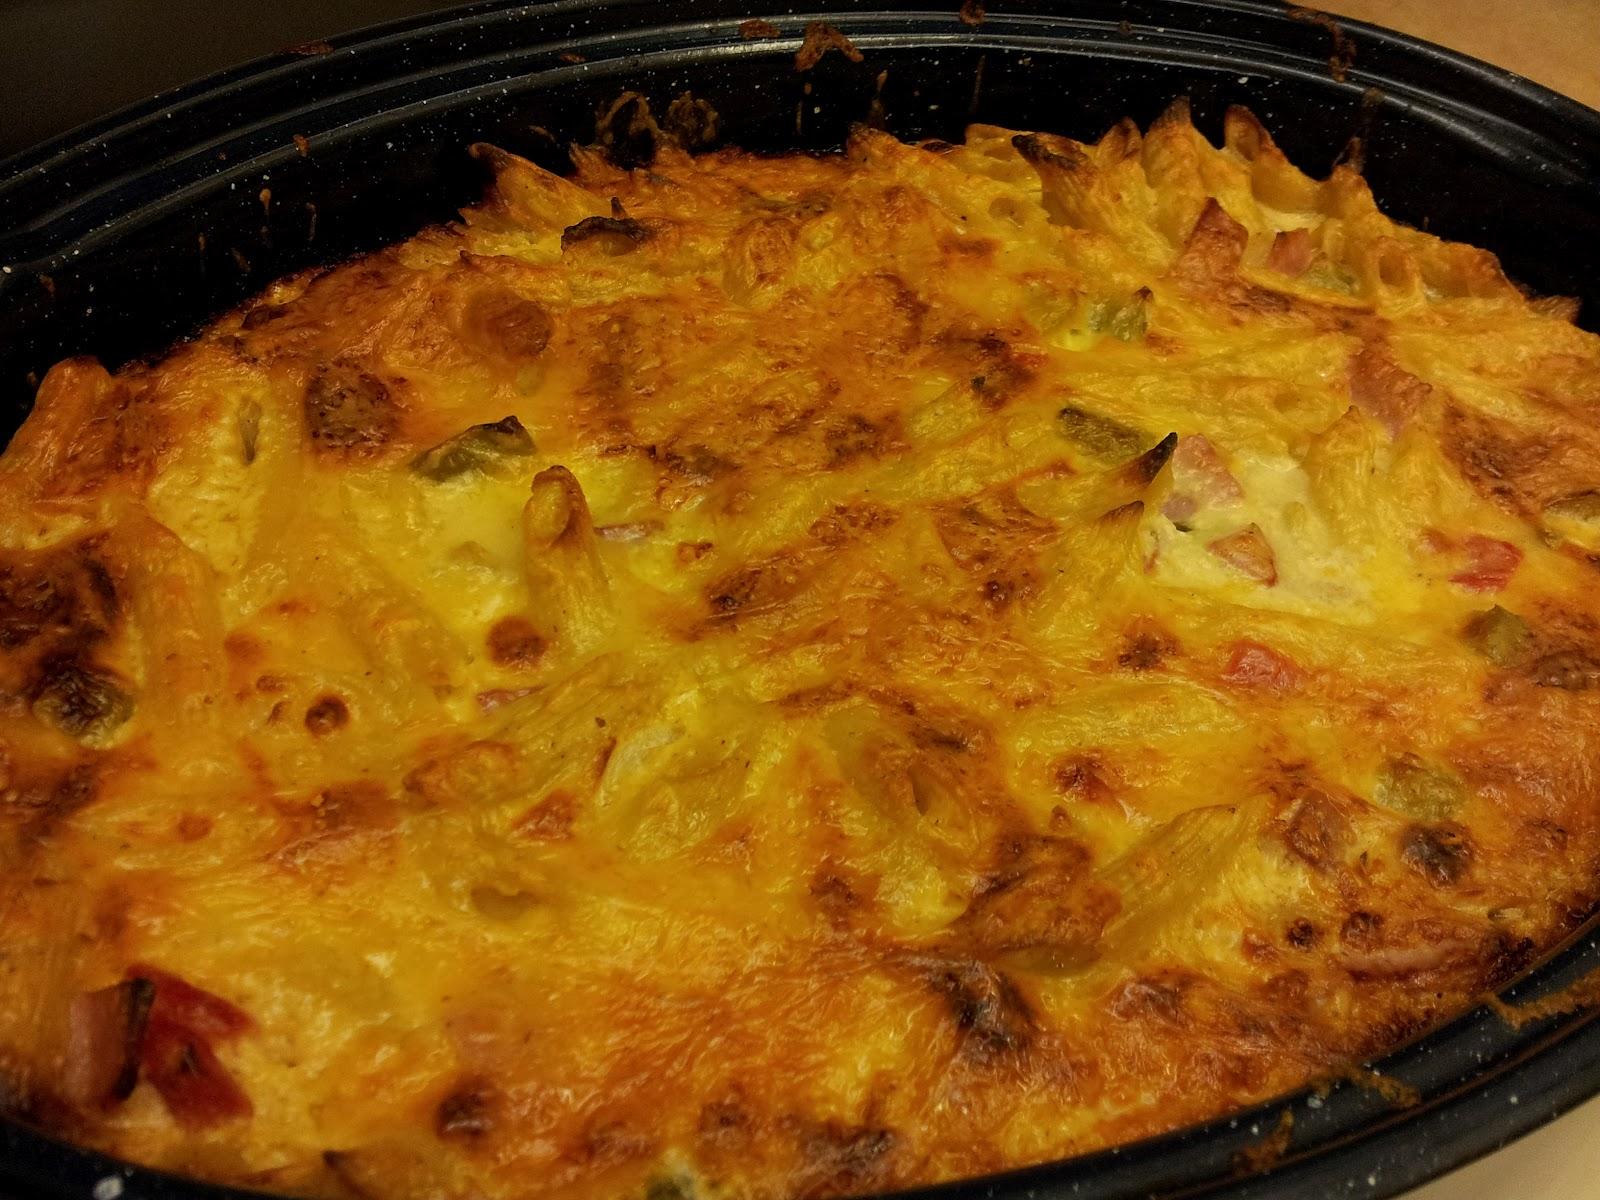 Gratin de Macaroni (Macaroni and Cheese)